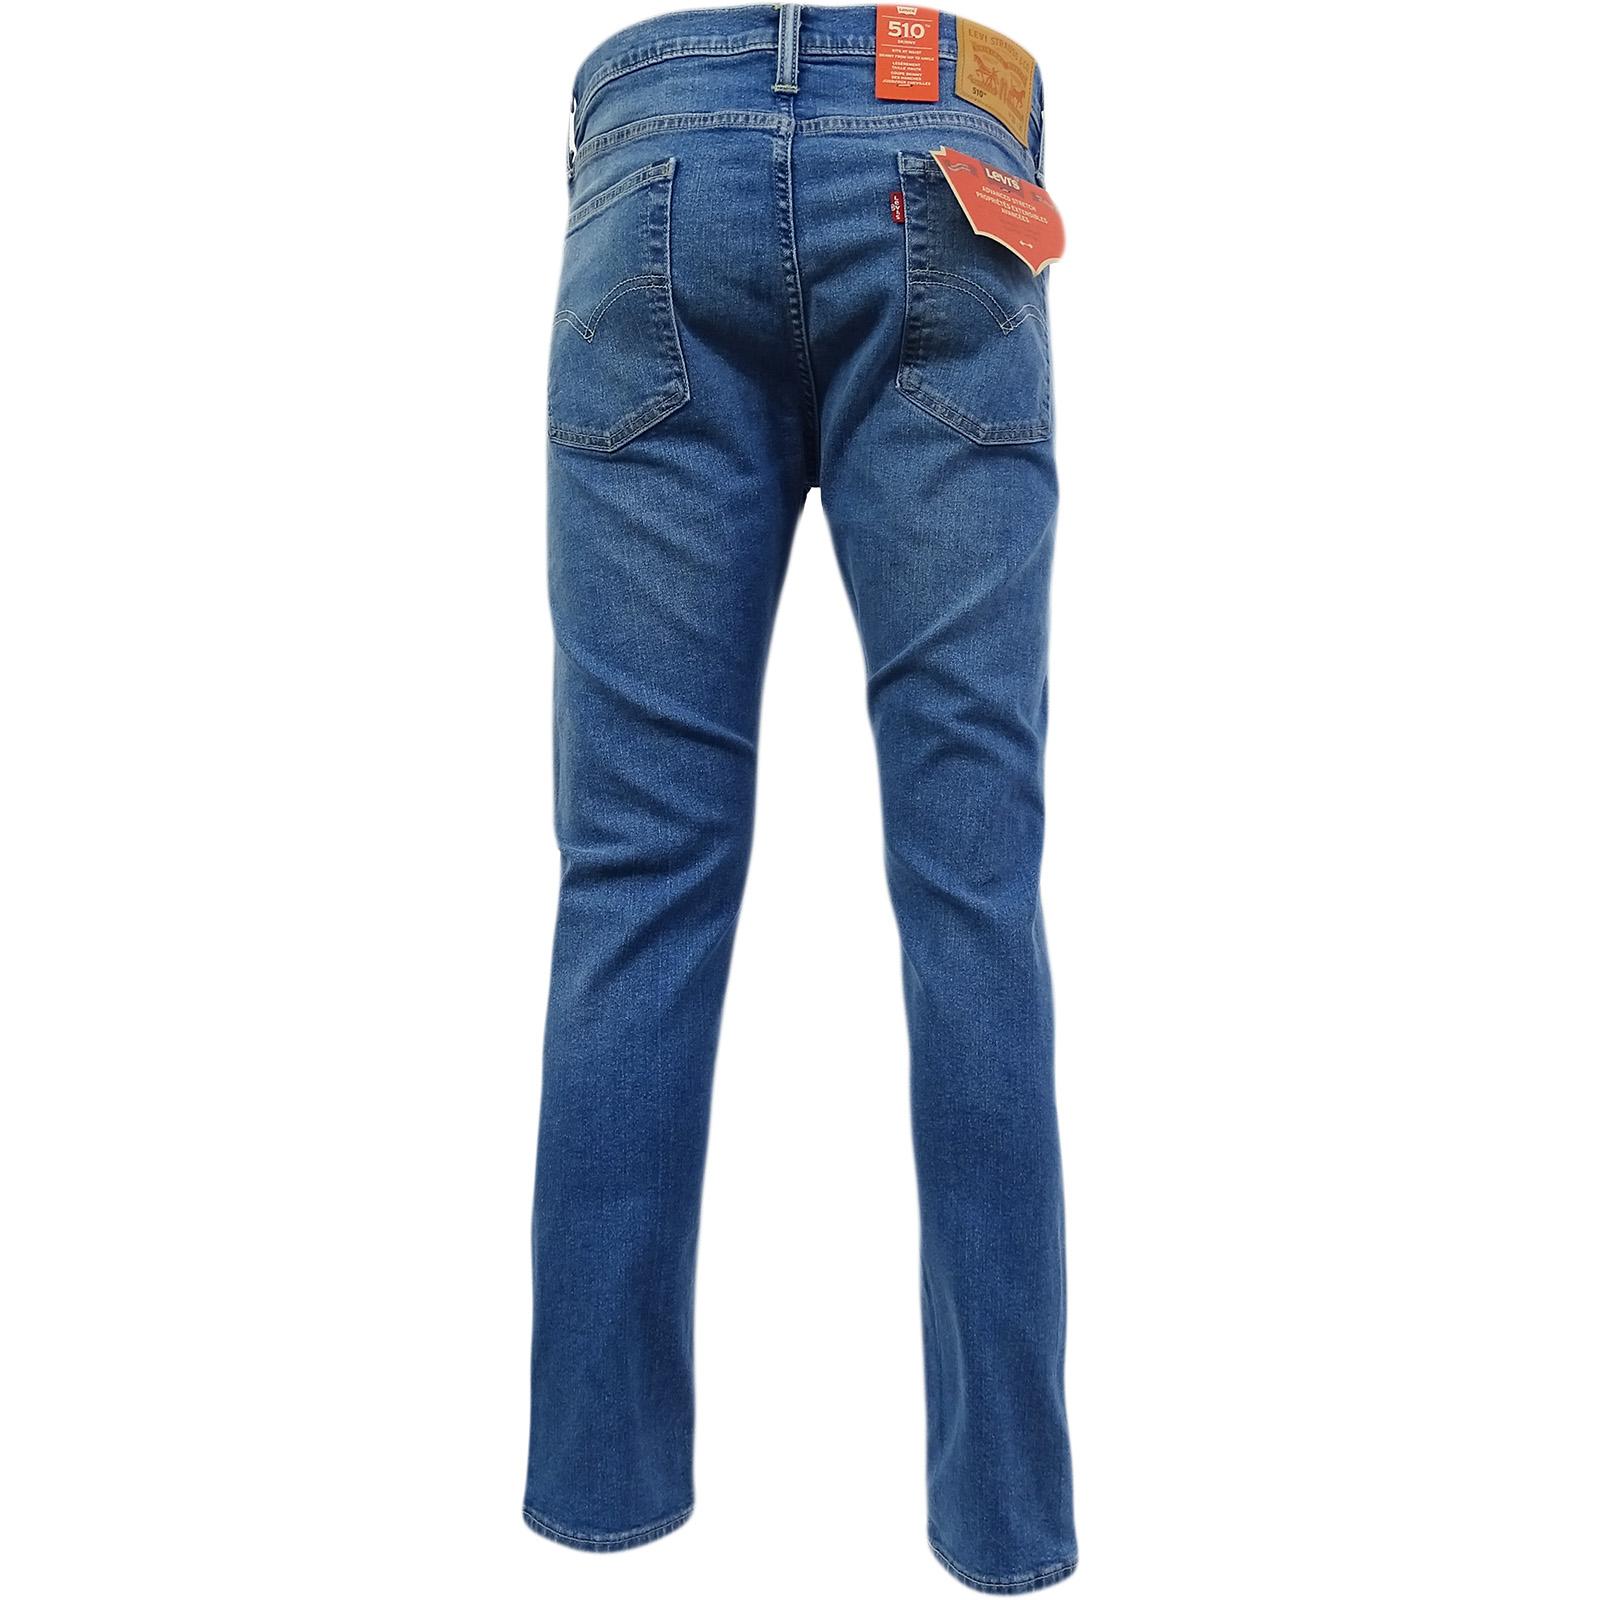 9068722b Levi Strauss 510 Skinny Leg Jean Mid Blue Stretch Huxley 07-65 | eBay